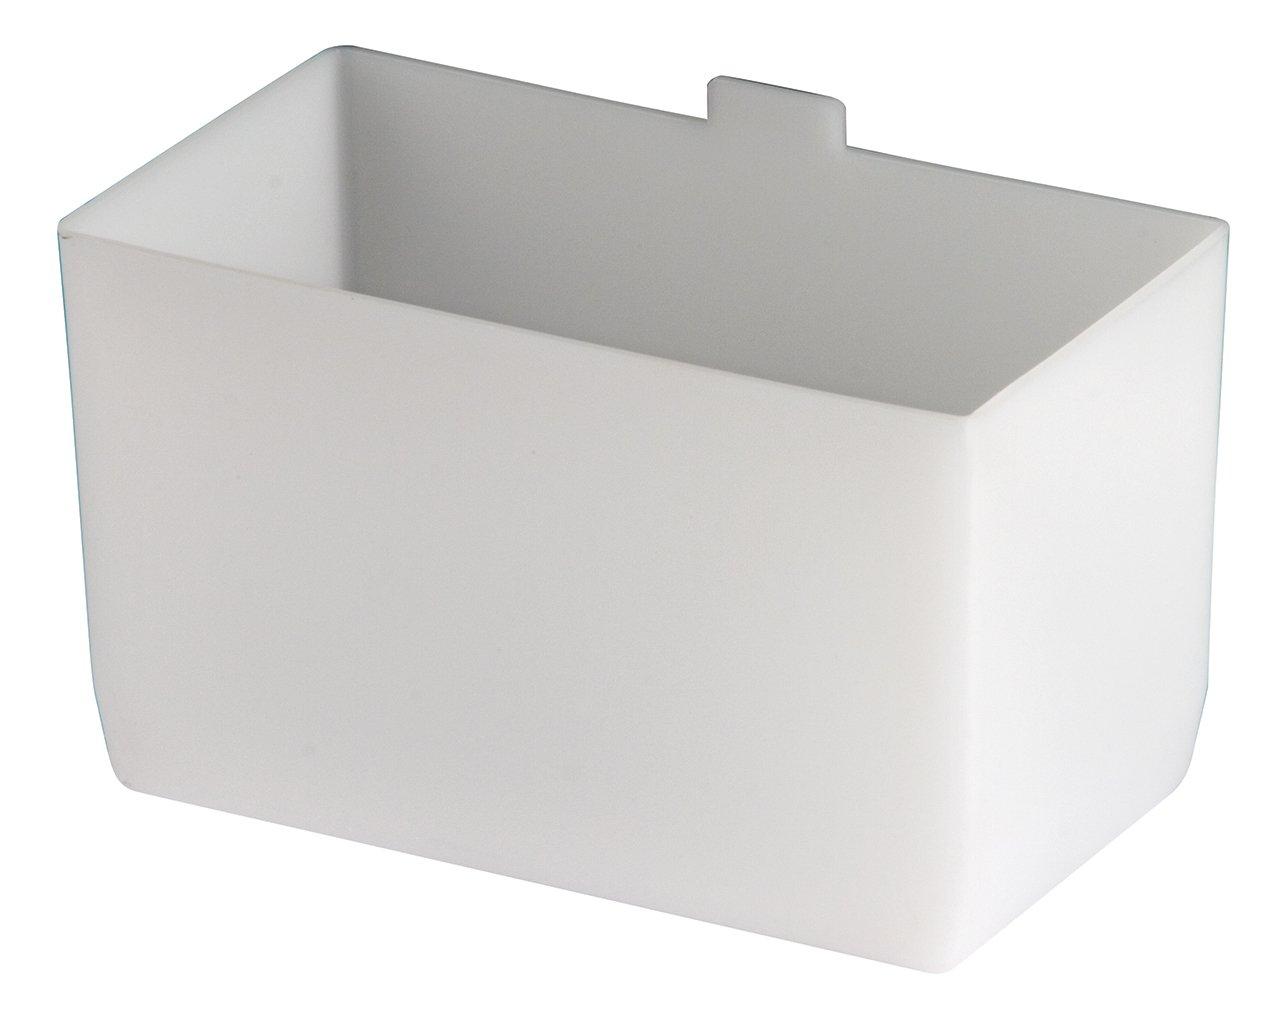 Akro-Mils 30102 2-3/4-Inch by 5-Inch by 3-Inch Large Bin Cup for Shelf Bins, White, 24-Case